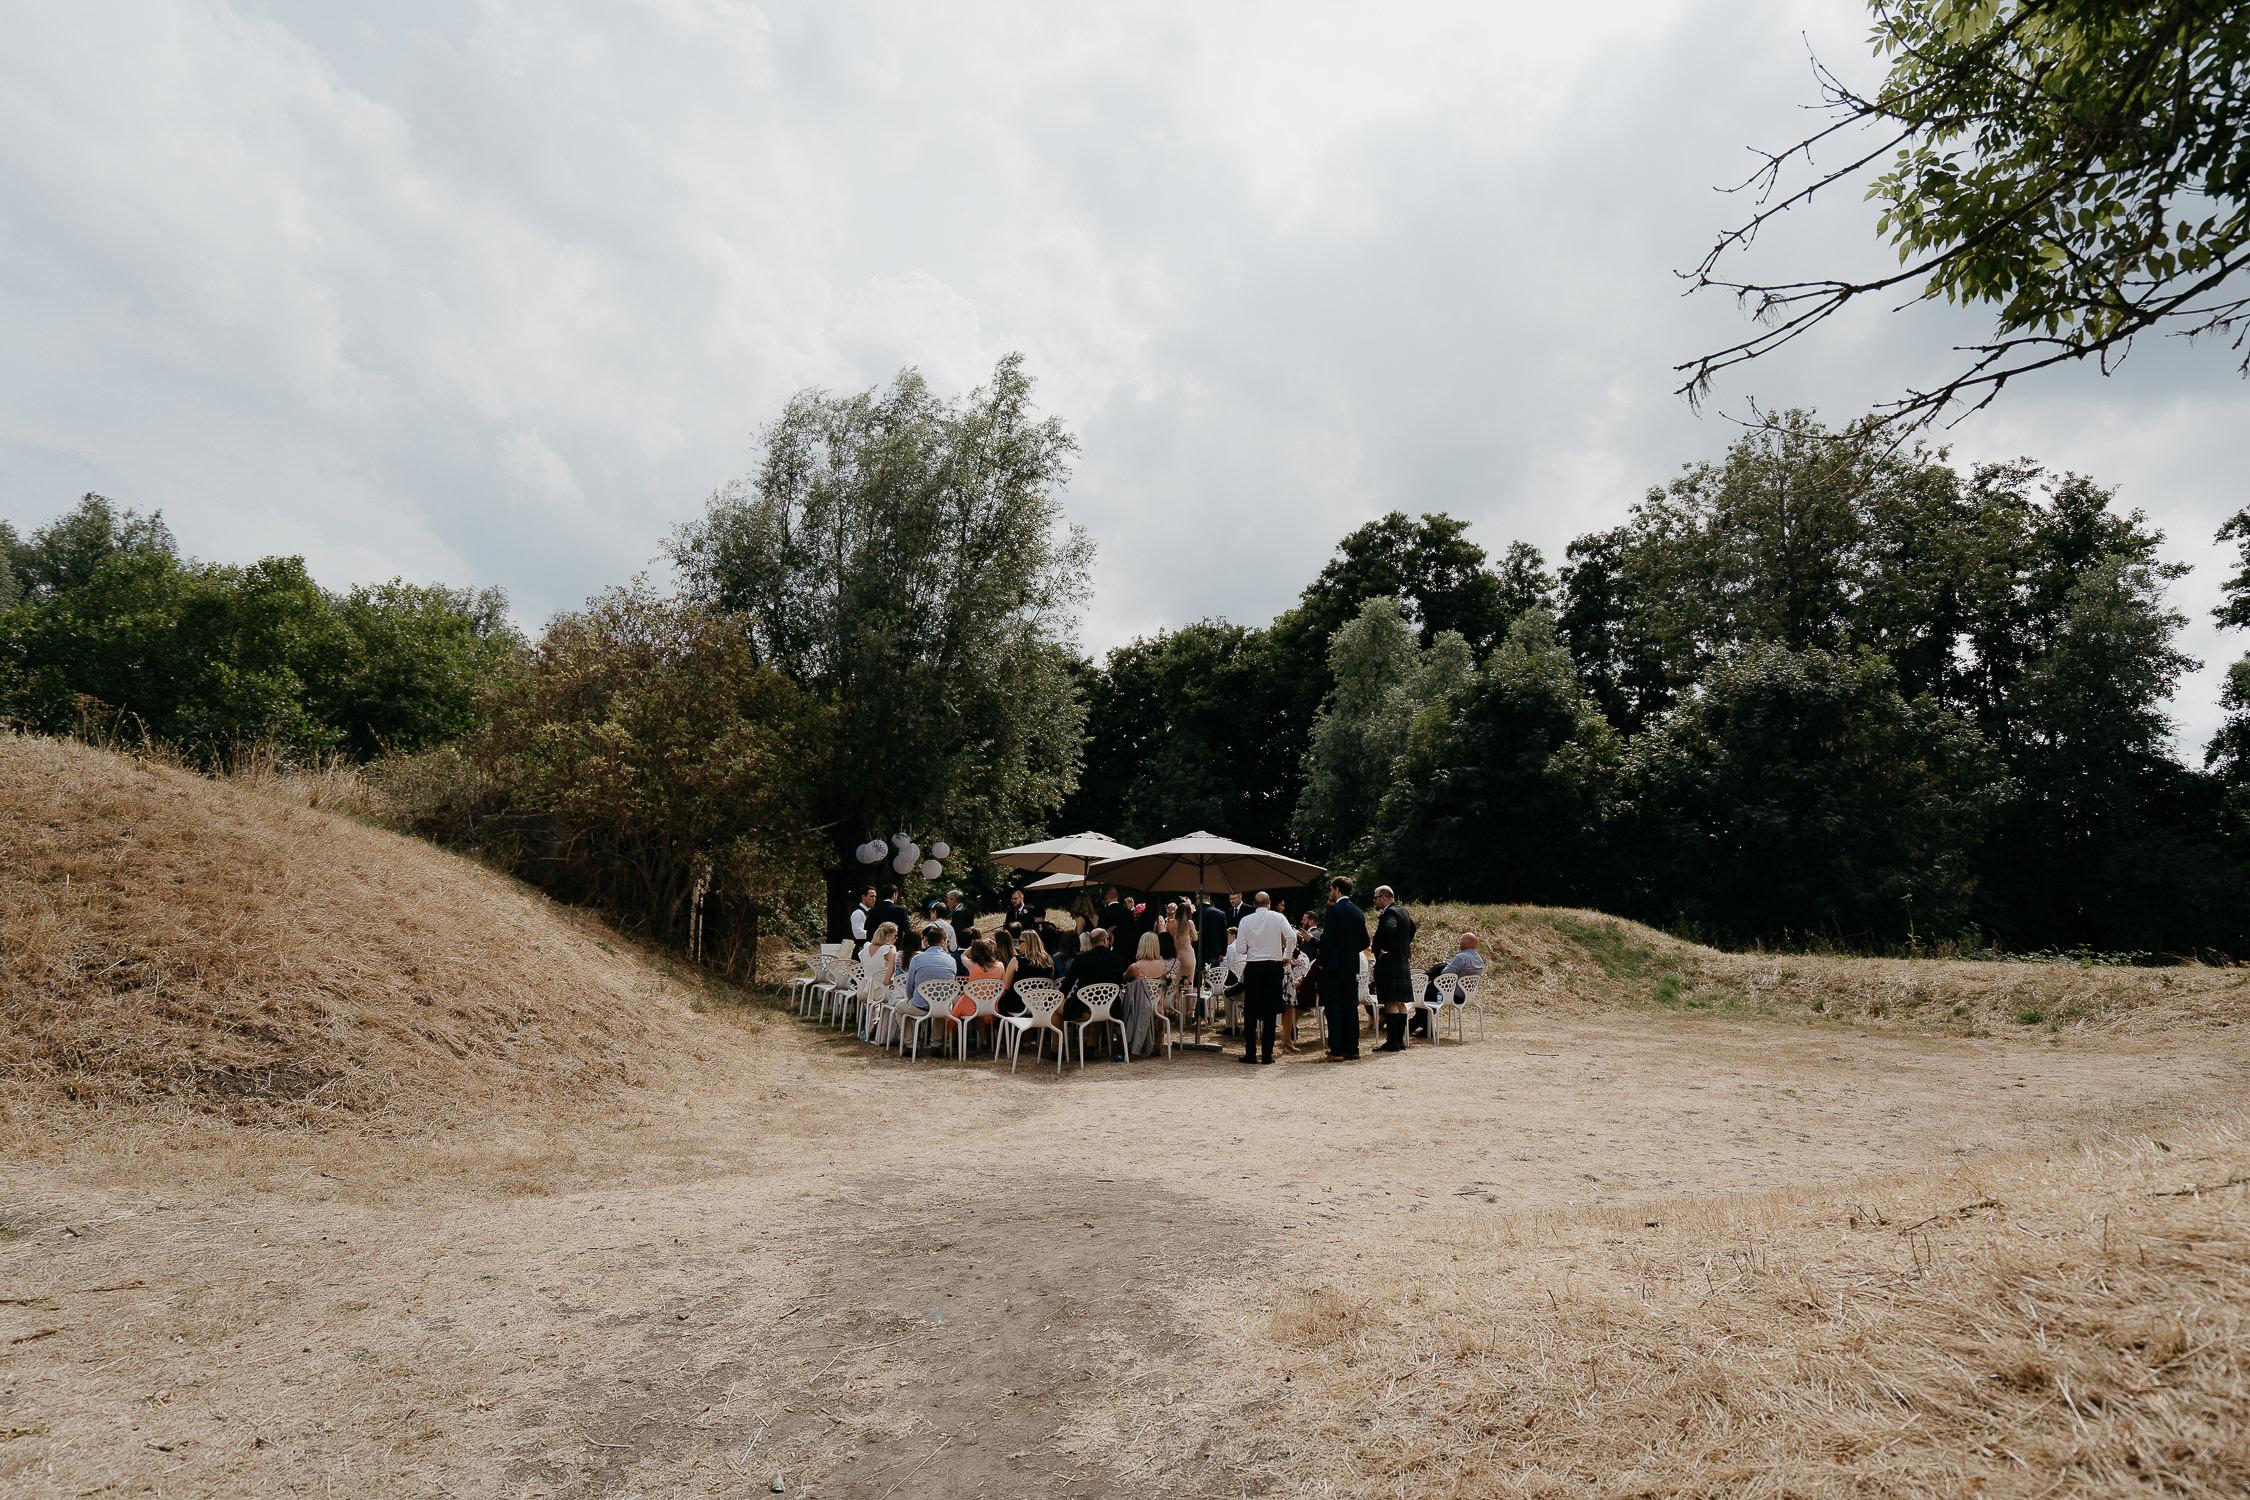 Beautiful wedding ceremony location puur paviljoen photographer Mark Hadden